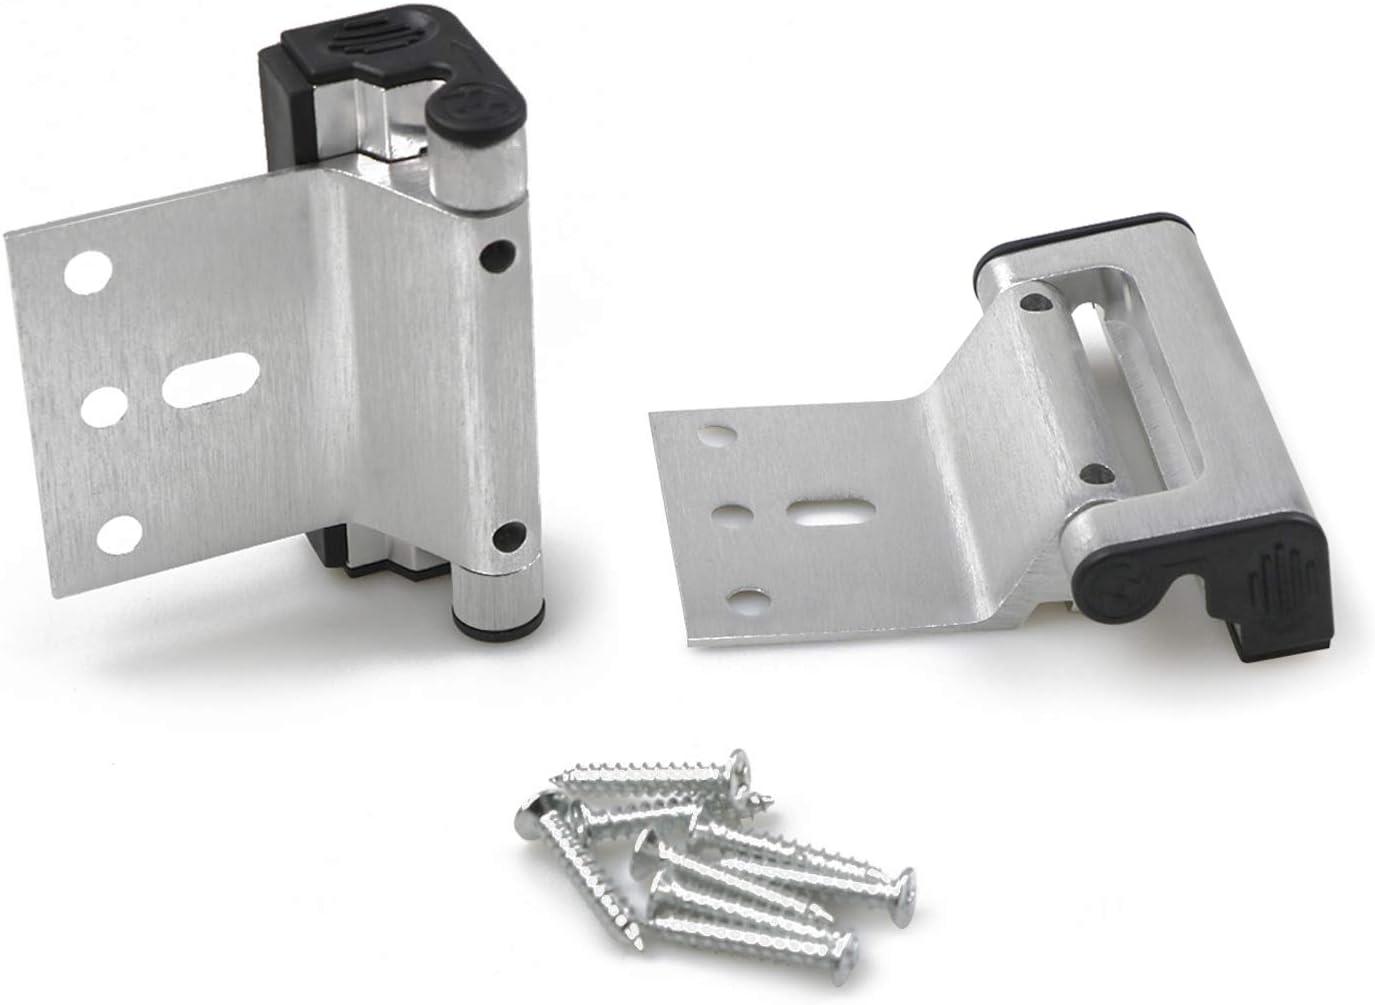 HoneSecur 2 Pack Upgraded Door Reinforcement Lock, Home Security Childproof Lock with 8 Screws Stop Withstand 800lbs for Inward Swinging Door - Silver